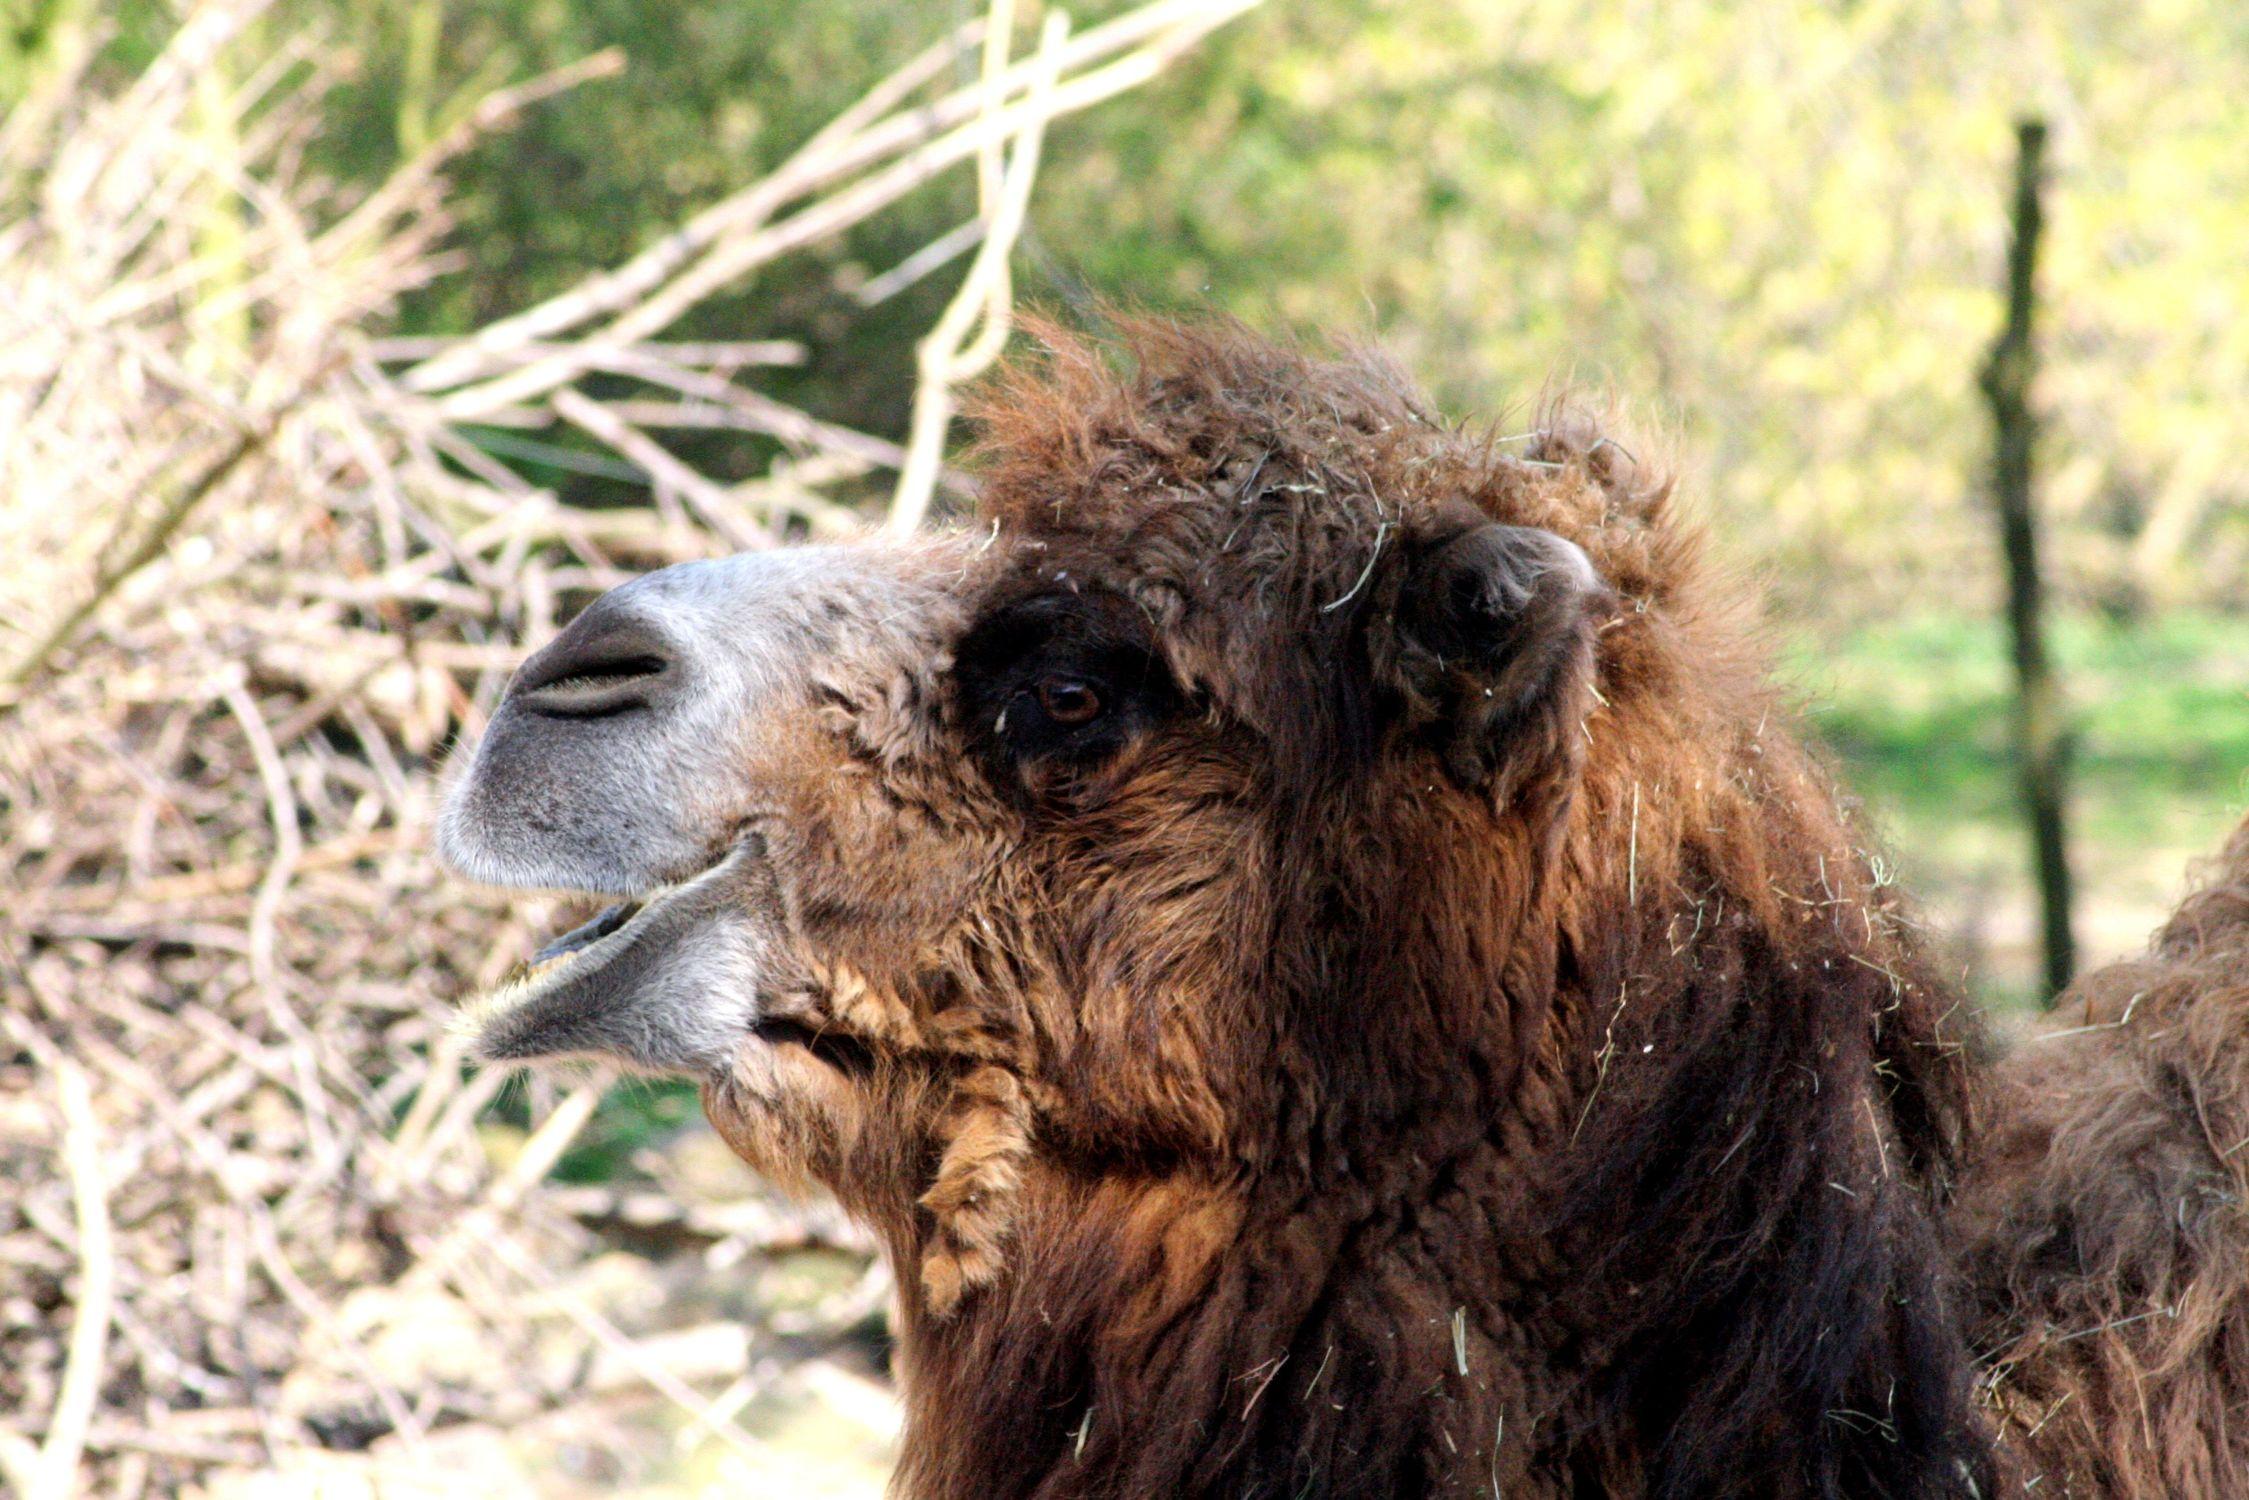 Bild mit Tiere, Säugetiere, Paarhufer, Kamele, Kamele, Alpakas, Lamas, Tier, Säugetier, Lama, Kamel